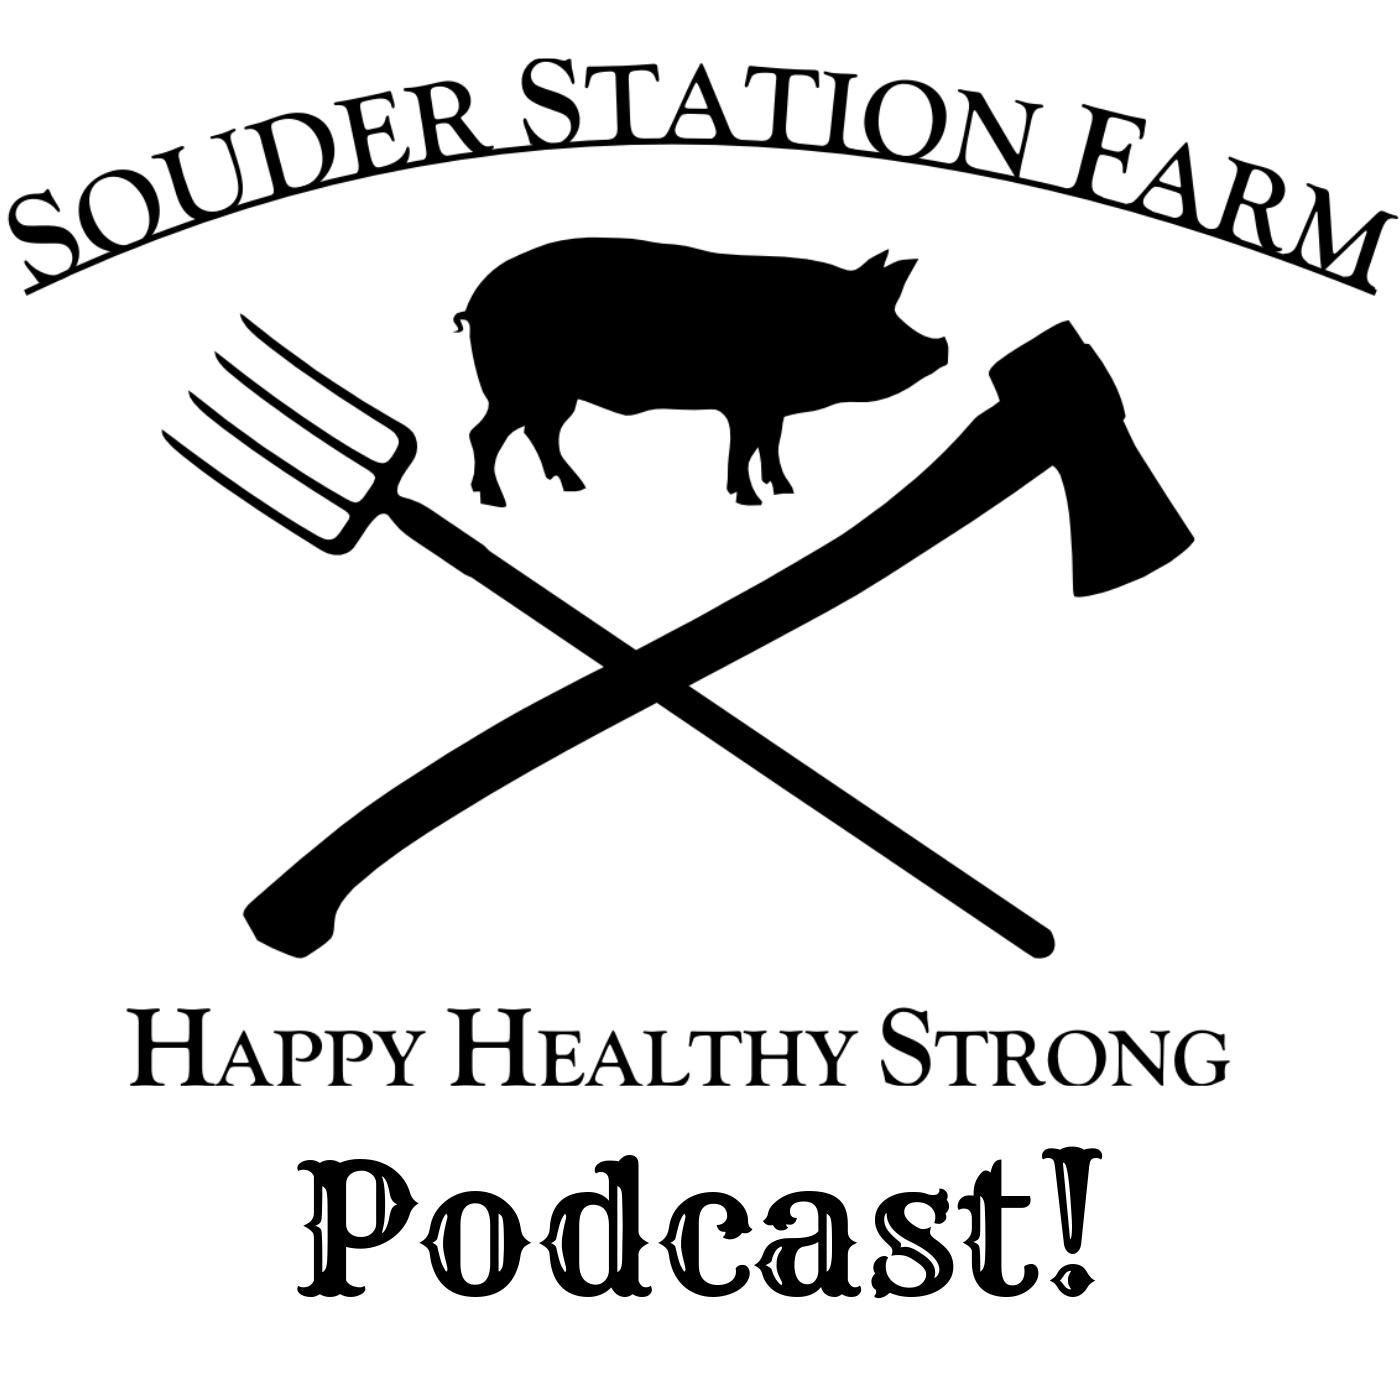 Souder Station Farm Podcast show art